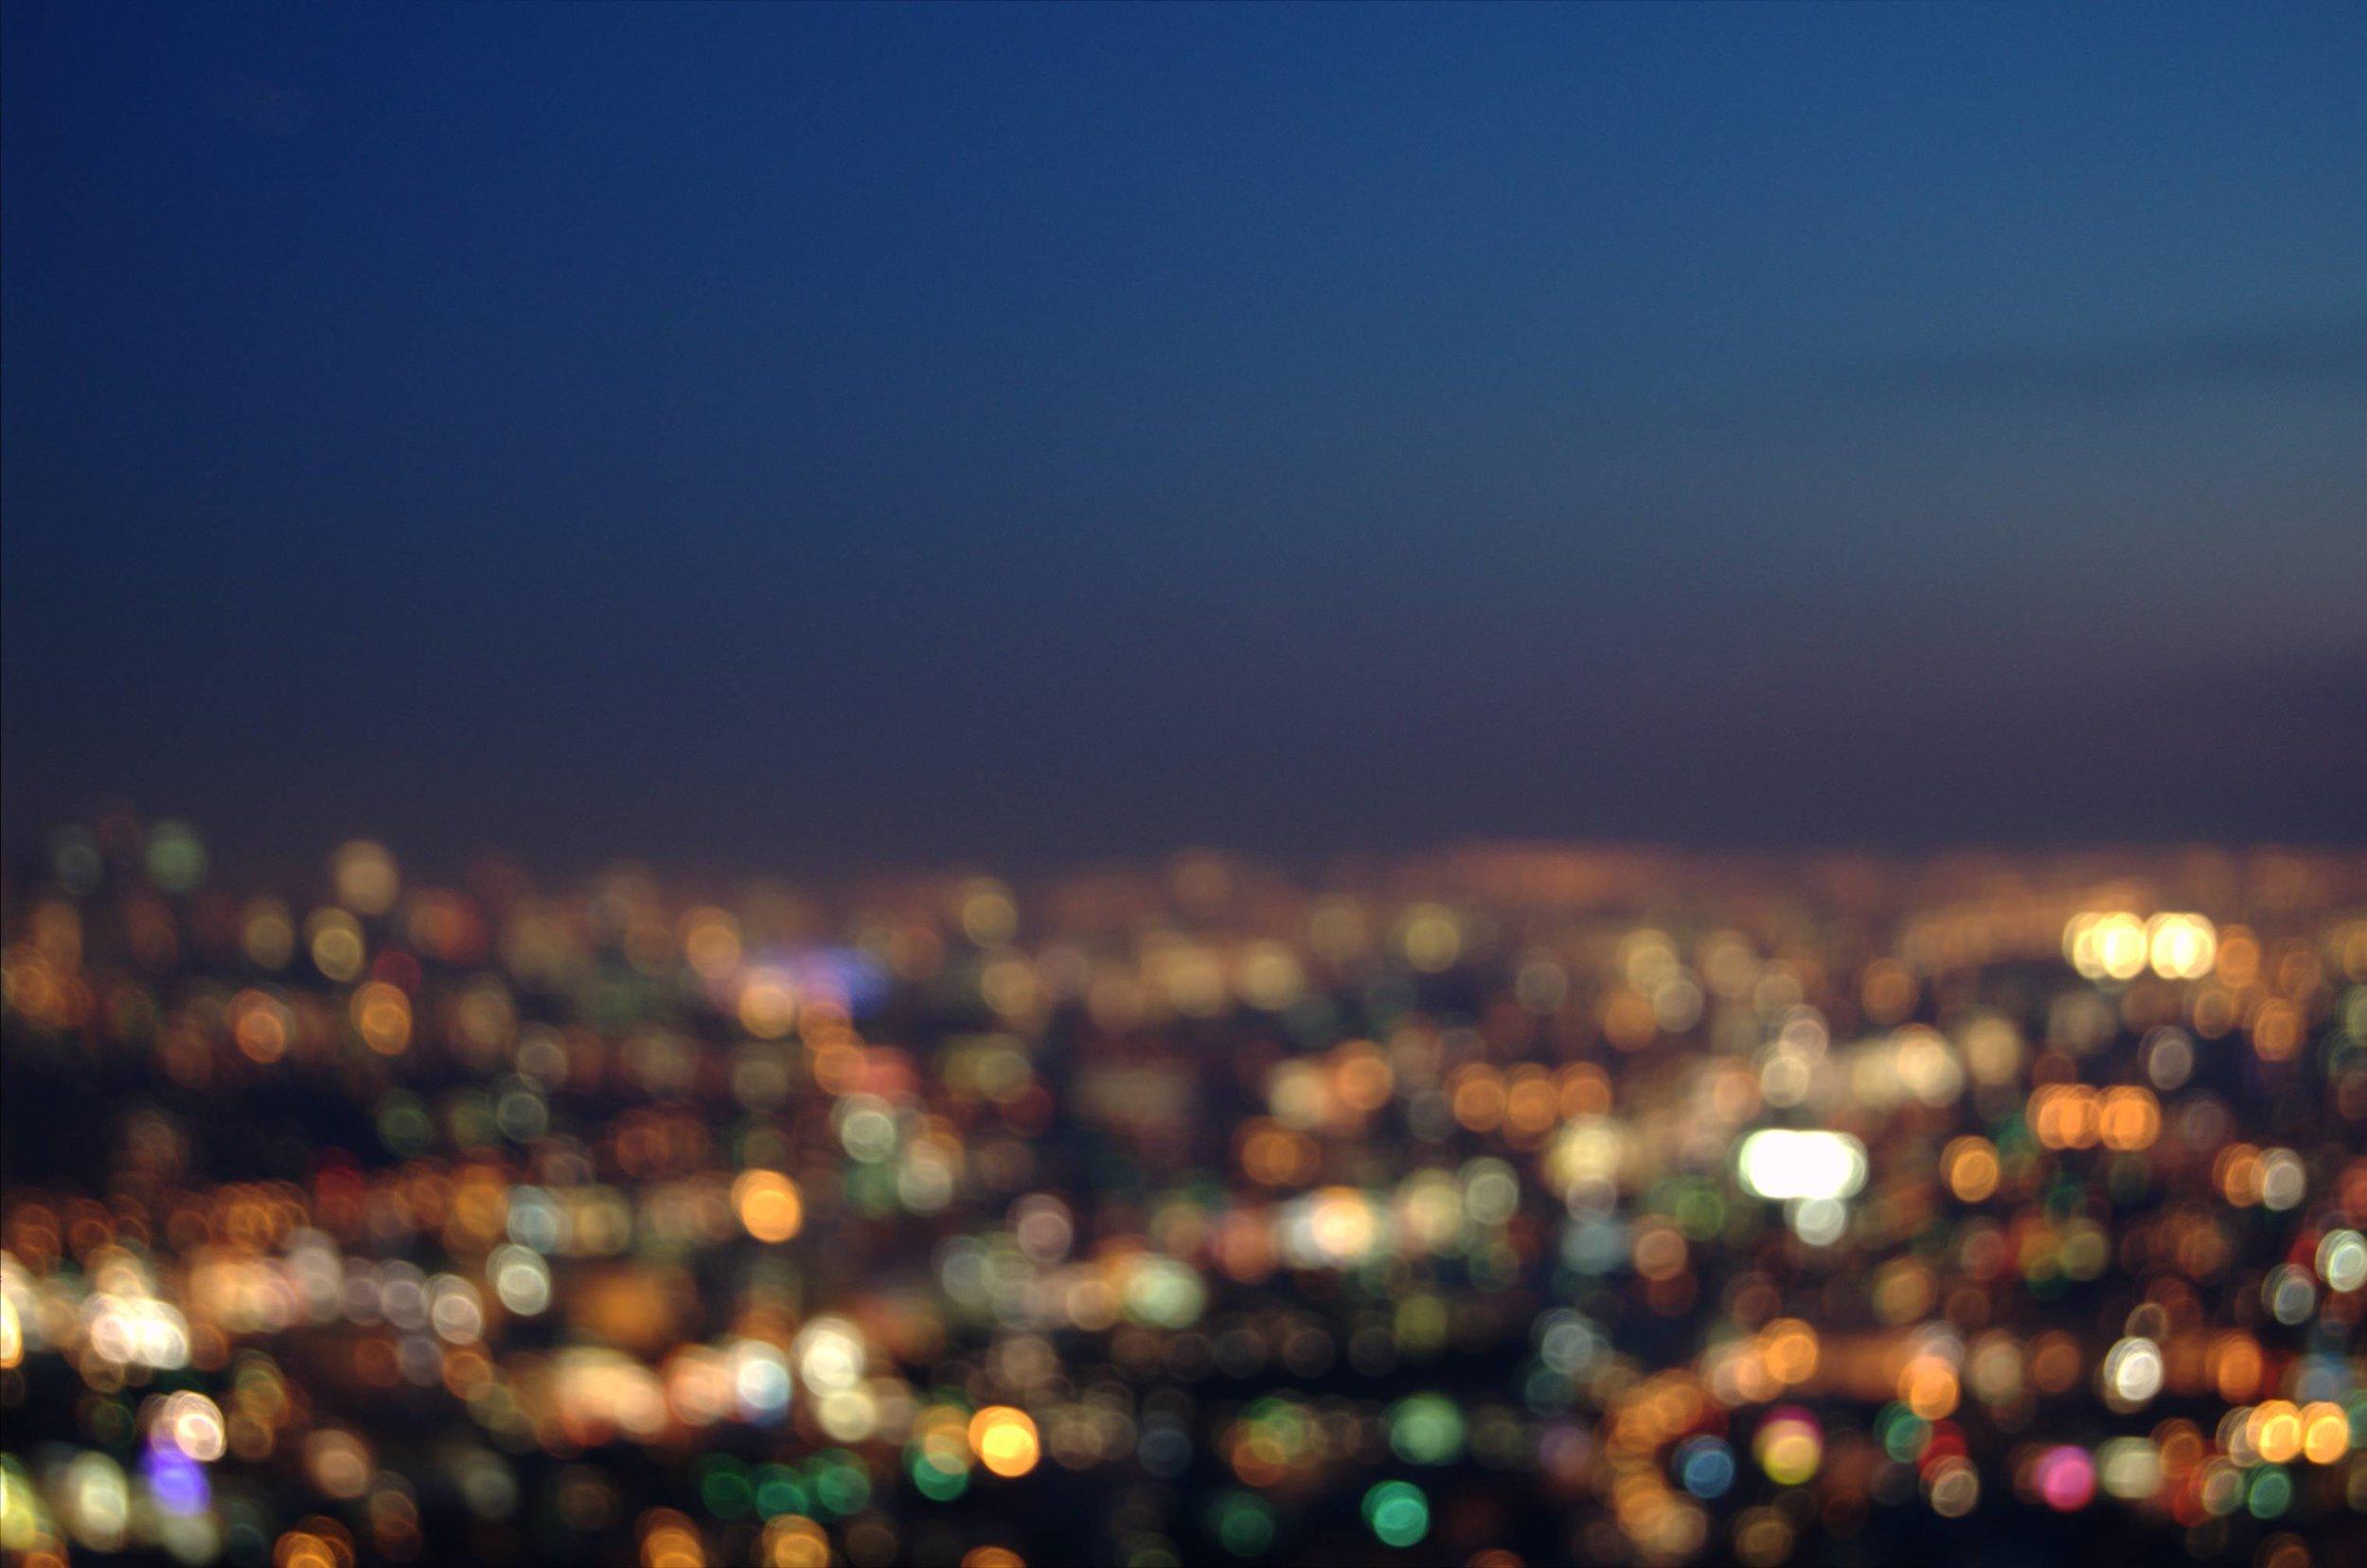 Abstract lights.jpg